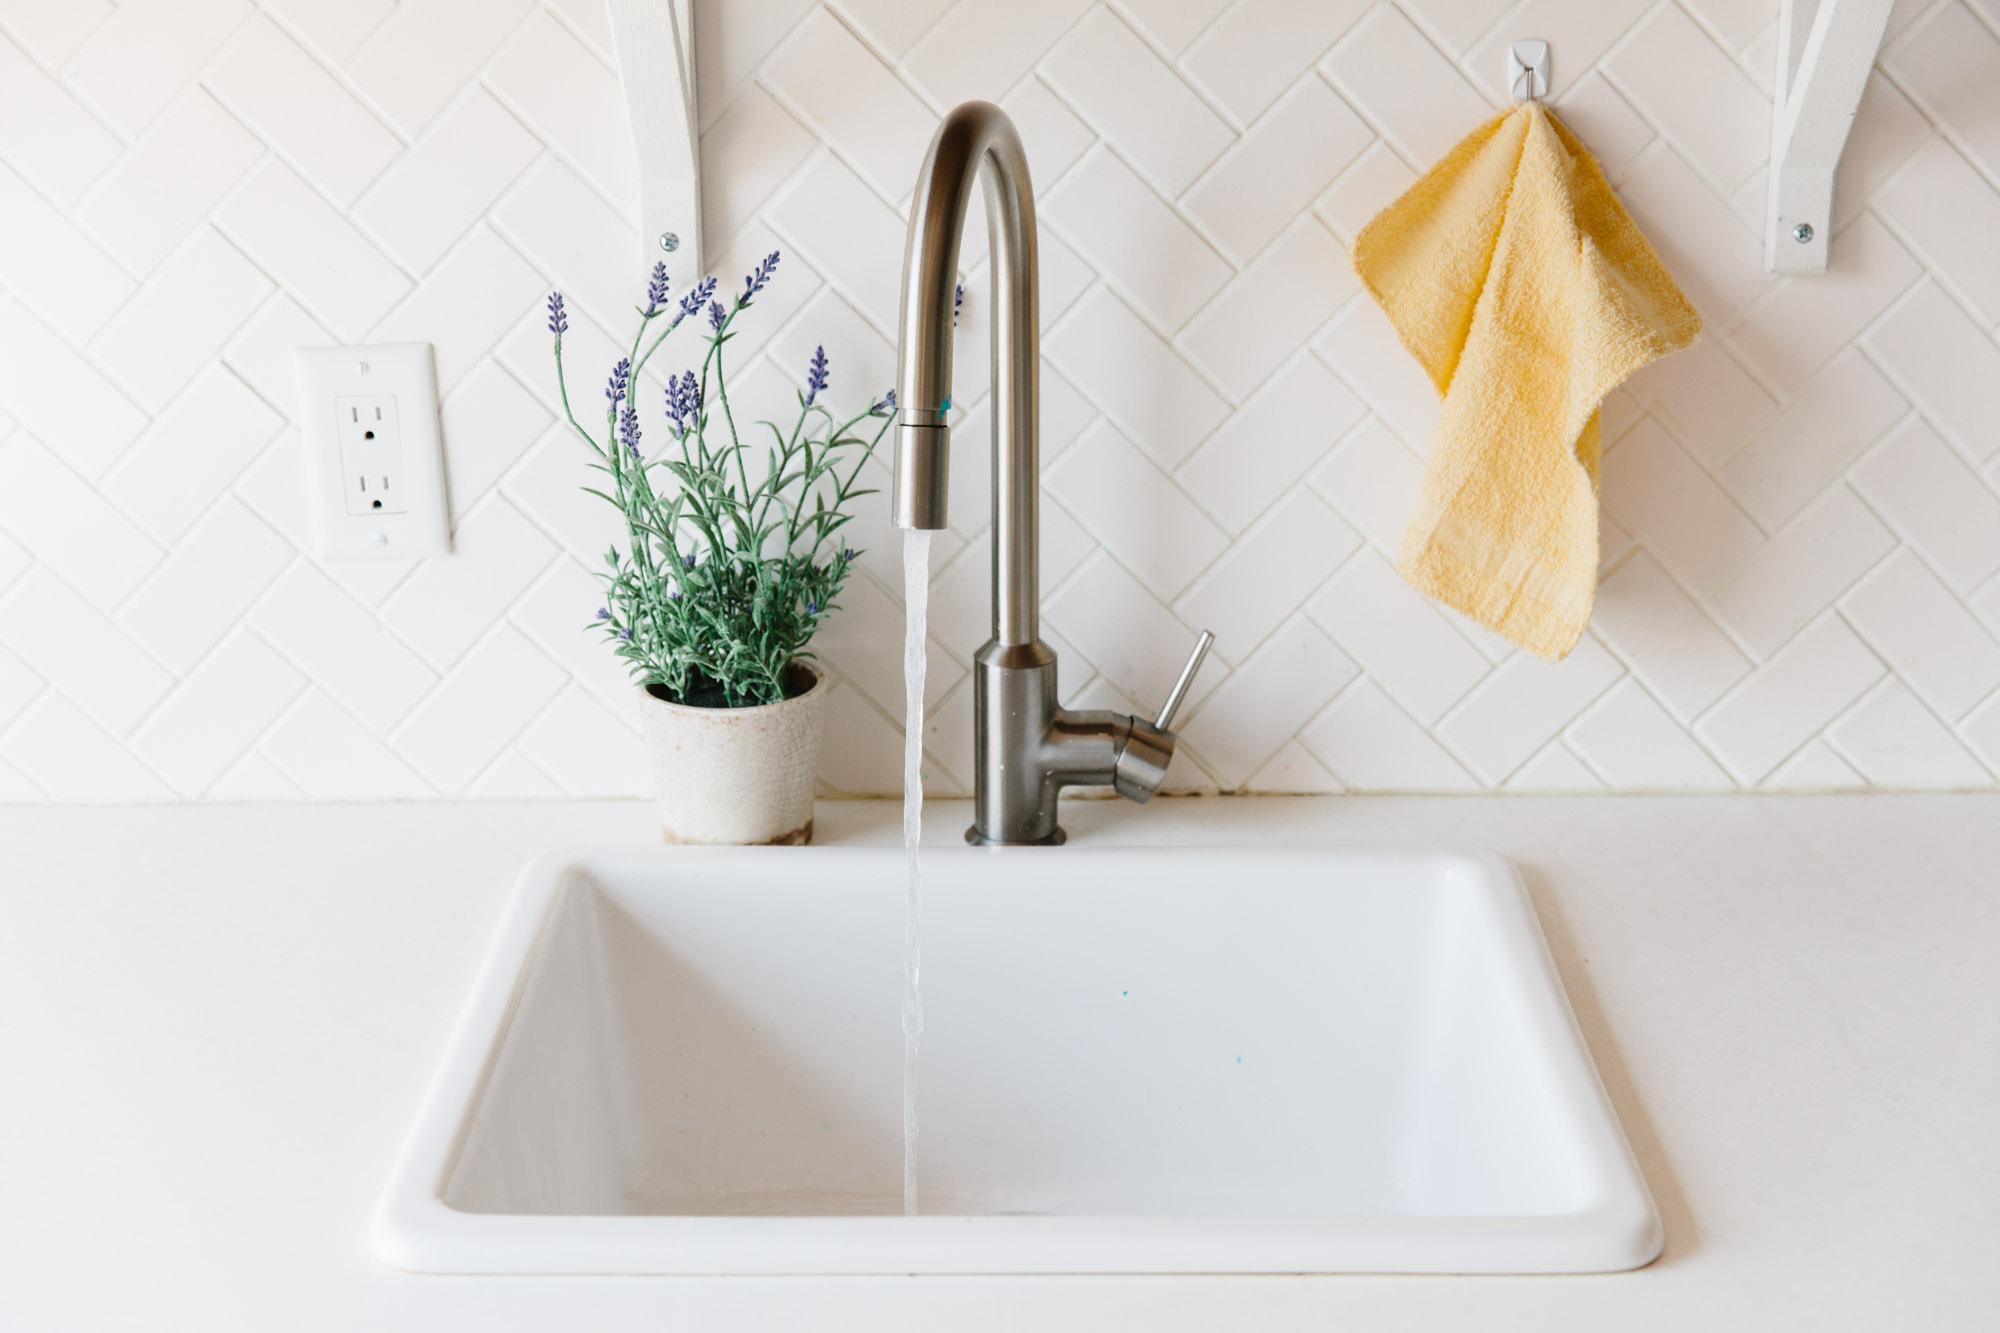 Amazing Get Rid Of Stinky Kitchen Sink Smells Kitchn Download Free Architecture Designs Intelgarnamadebymaigaardcom